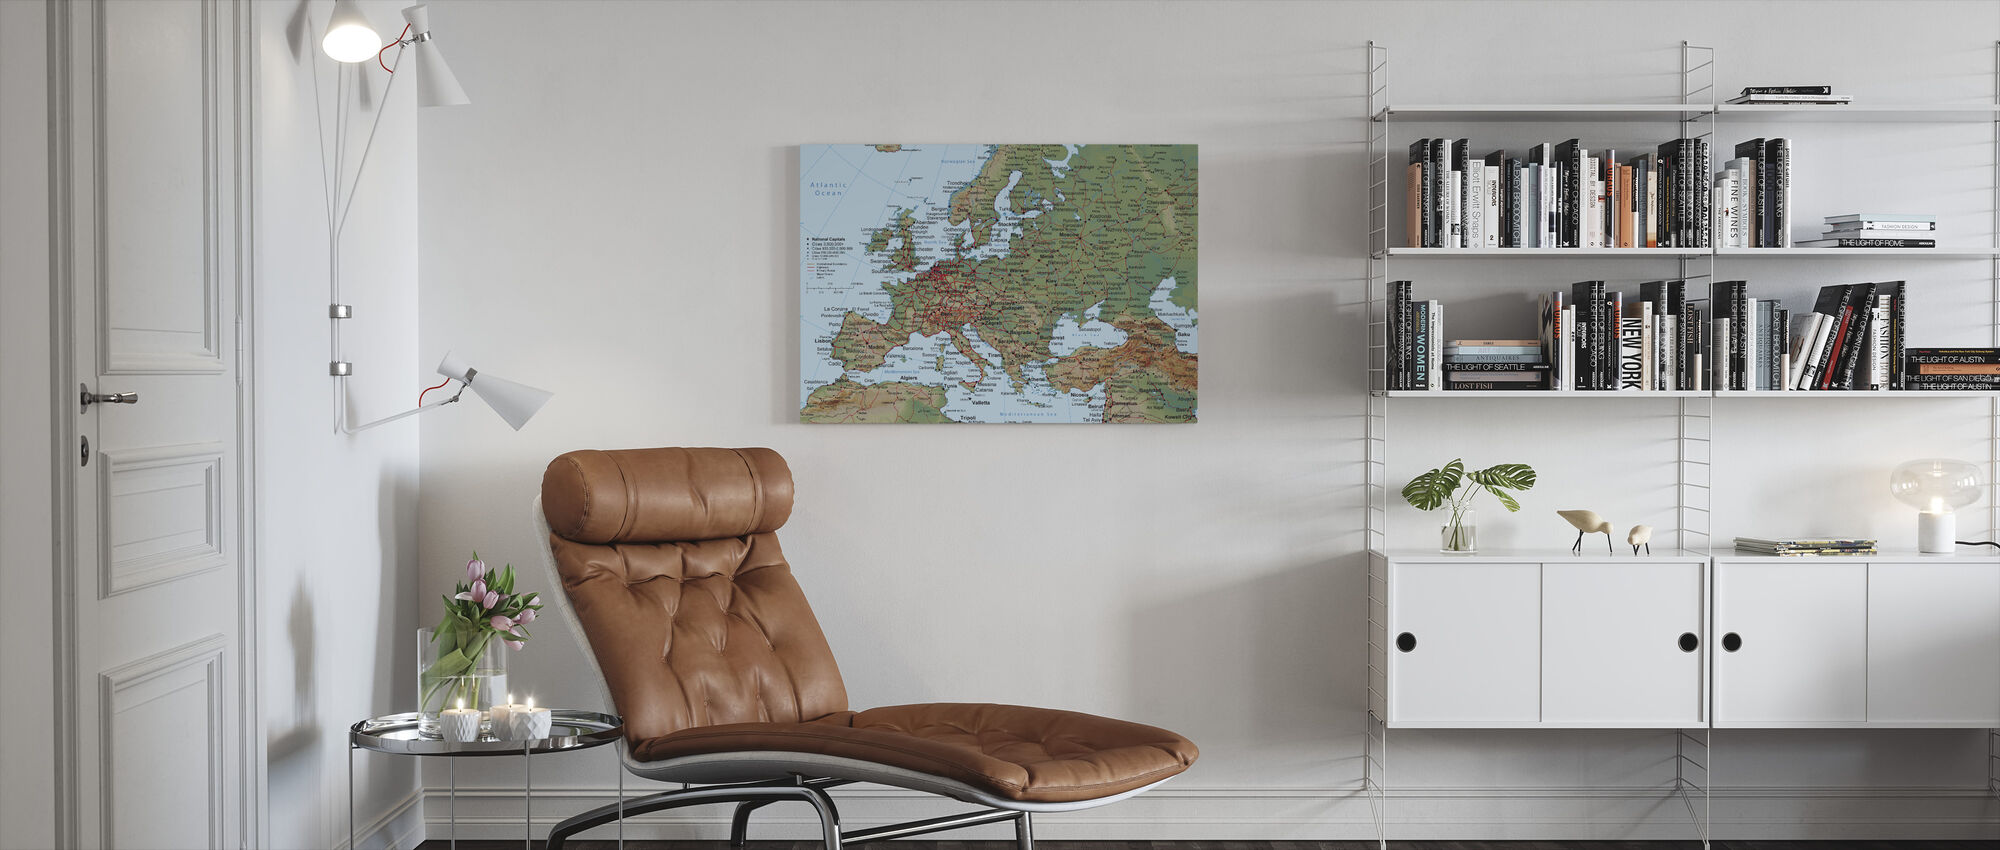 Europa Karta - Canvastavla - Vardagsrum